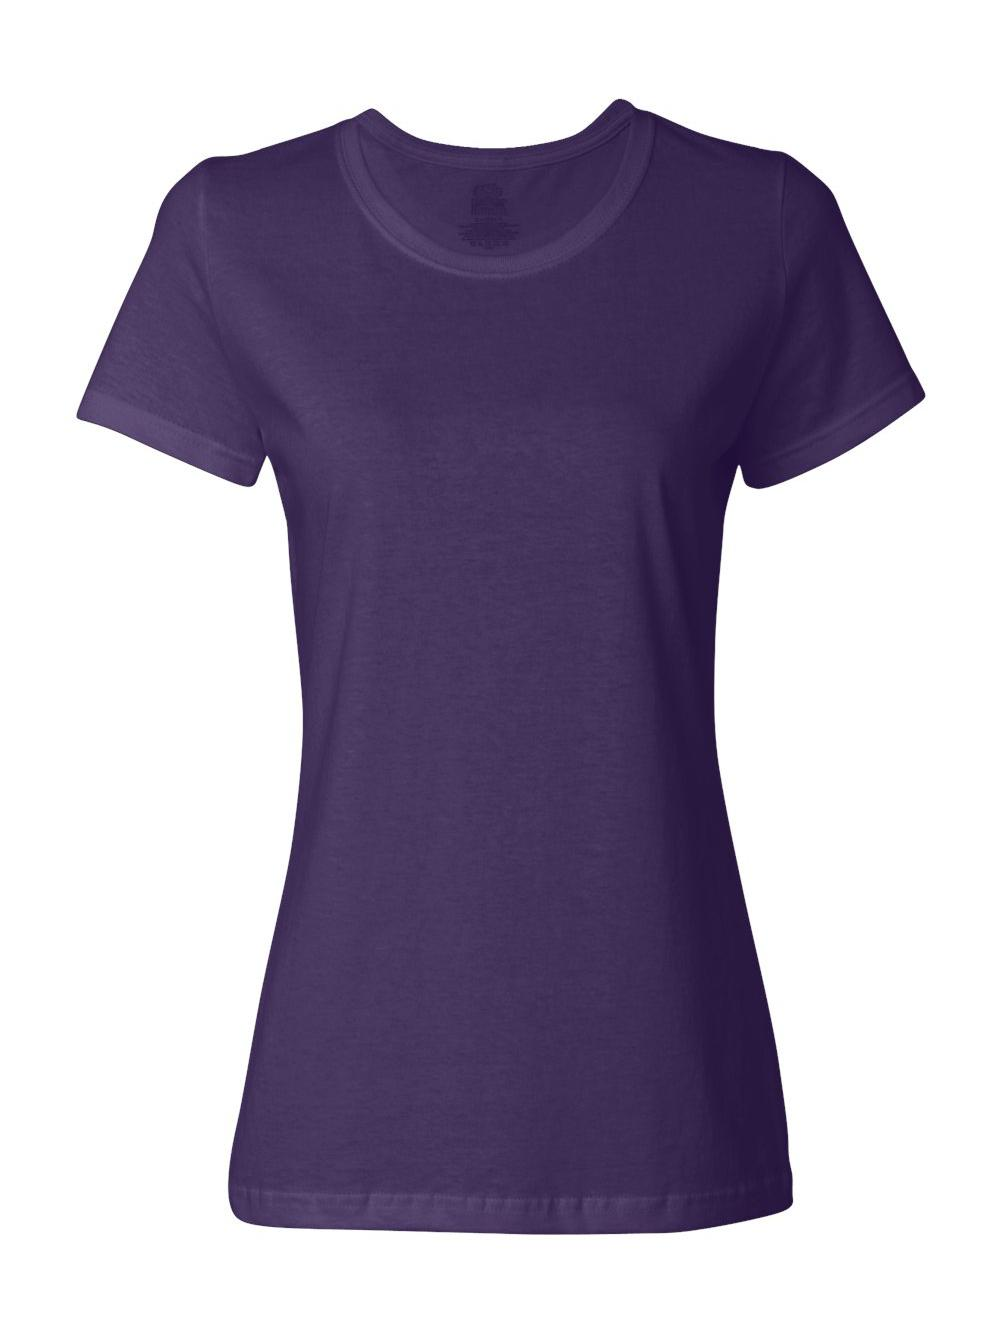 Fruit-of-the-Loom-HD-Cotton-Women-039-s-Short-Sleeve-T-Shirt-L3930R thumbnail 21